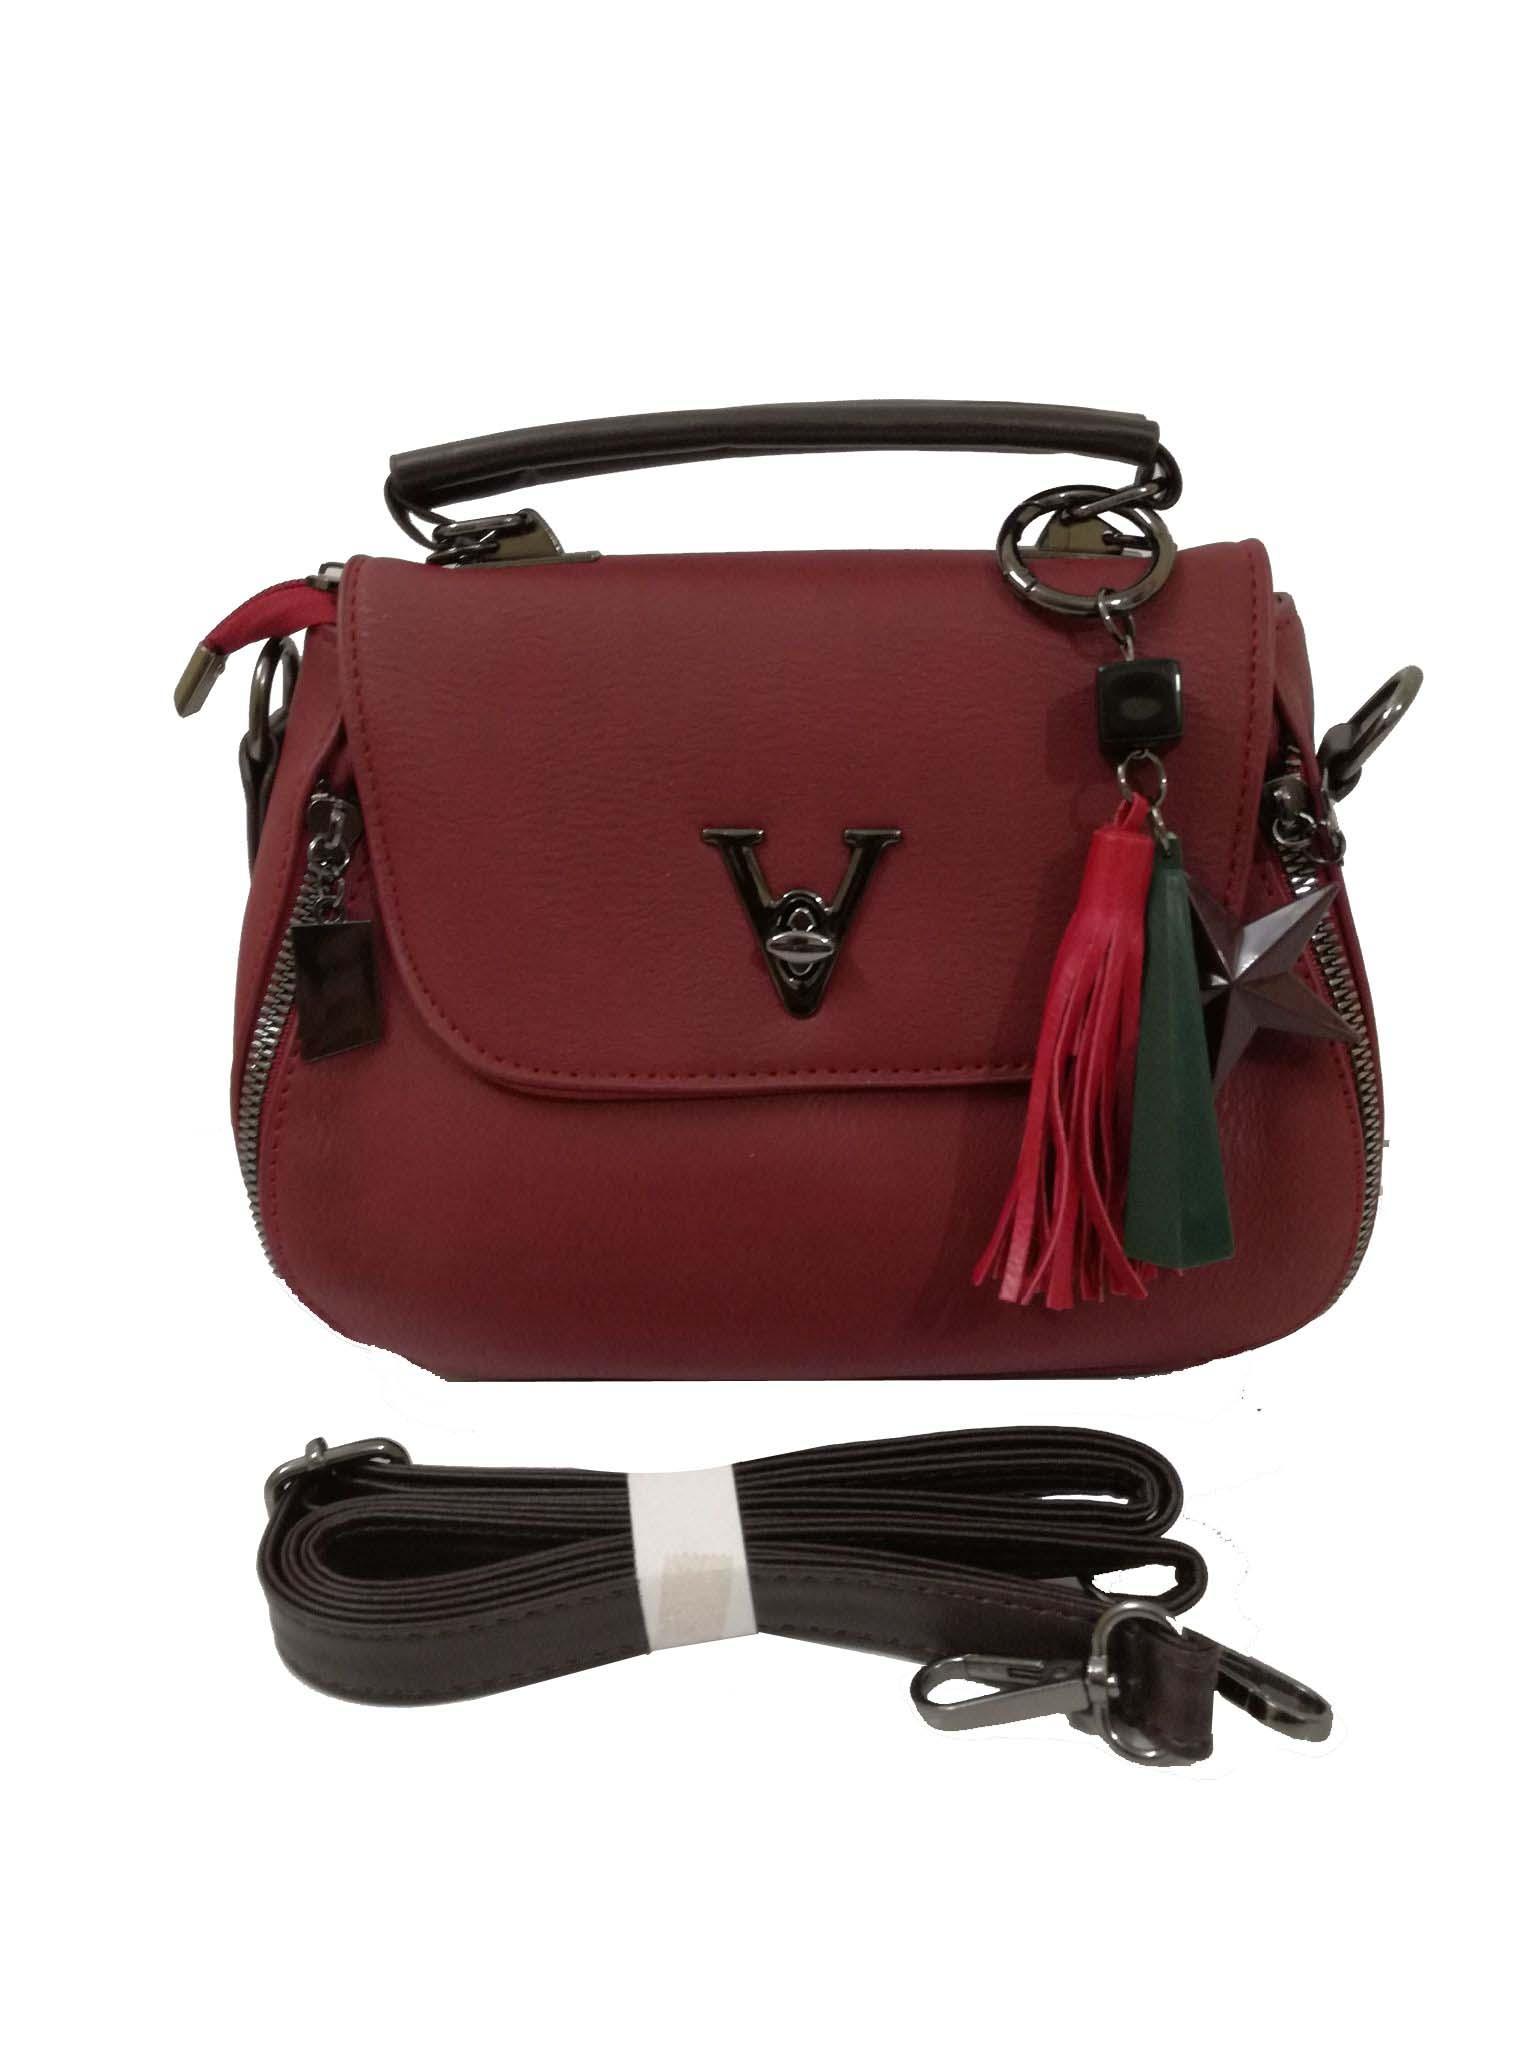 e9ee0a980c Women Cross Body   Shoulder Bags - Buy Women Cross Body   Shoulder ...